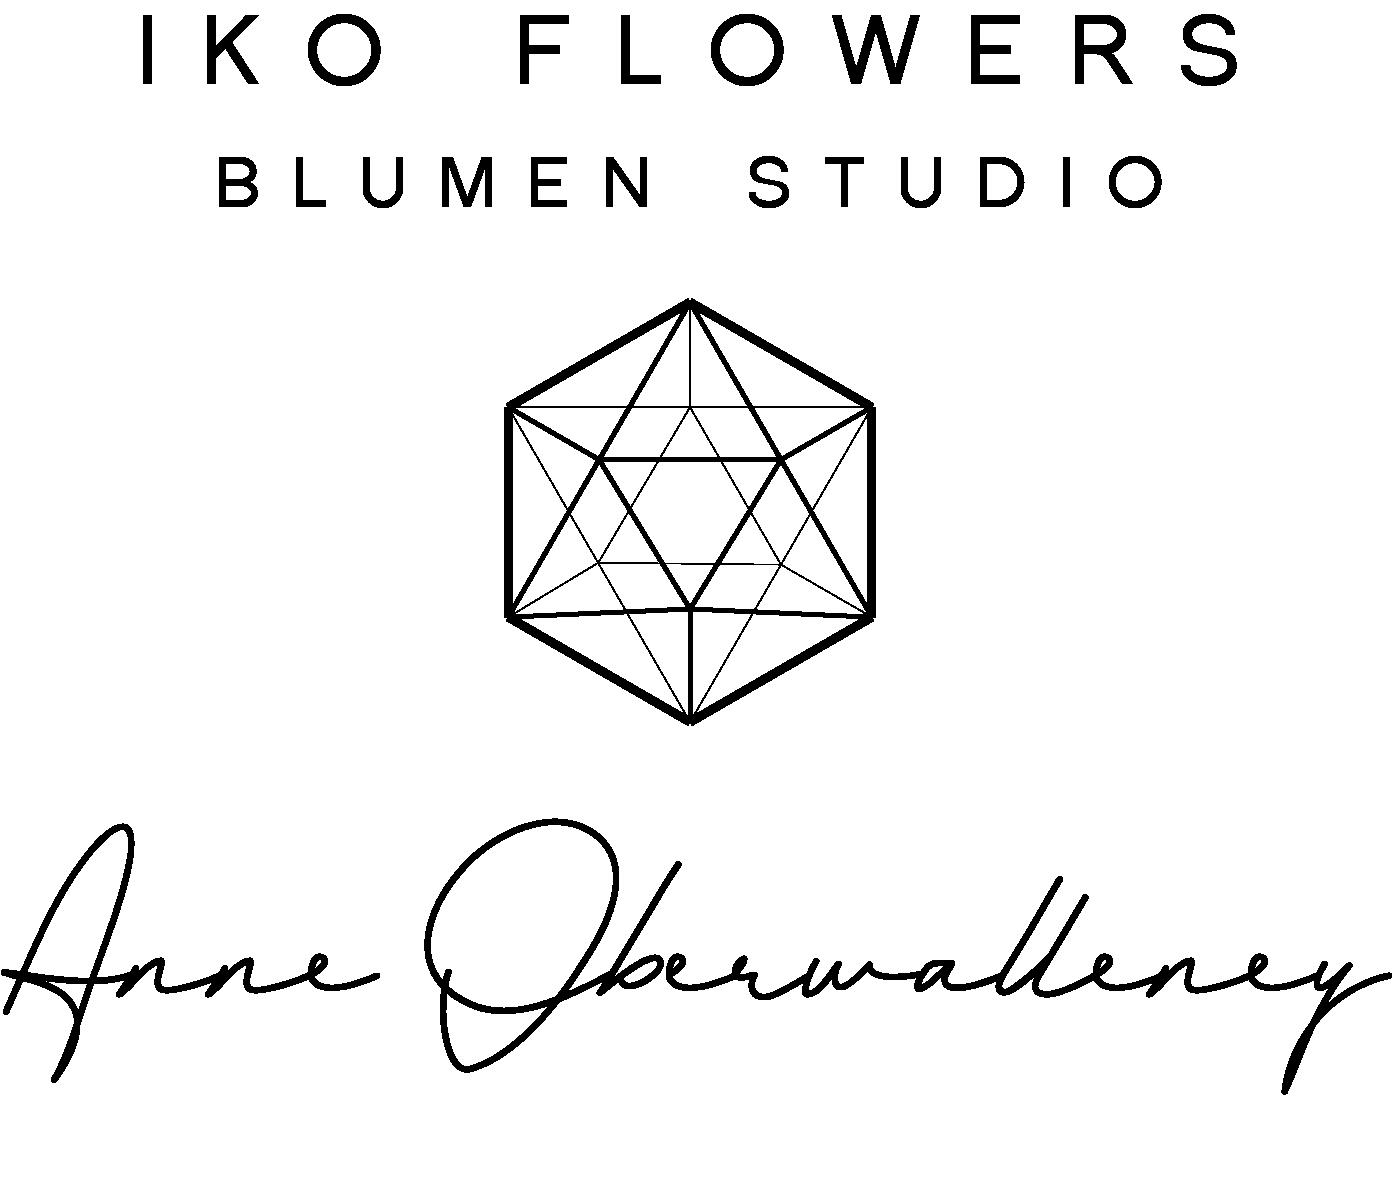 IKO Flowers Blumen Studio Logo 3 black.png